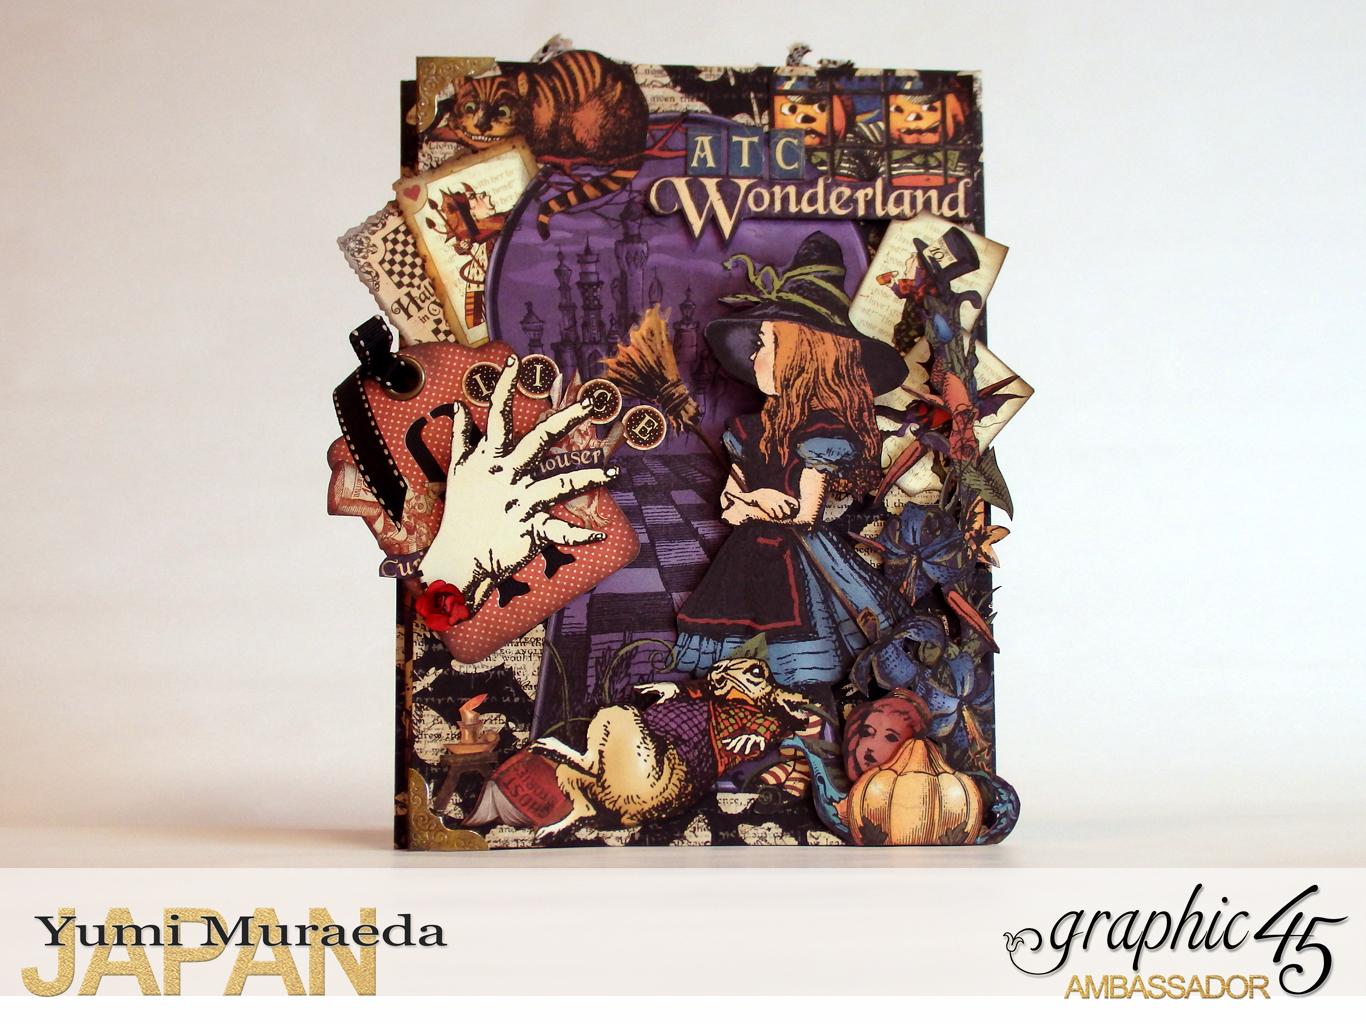 1ATC WonderlandHallowe'en in Wonderland by Yumi MuraeadaProduct by Graphic 45